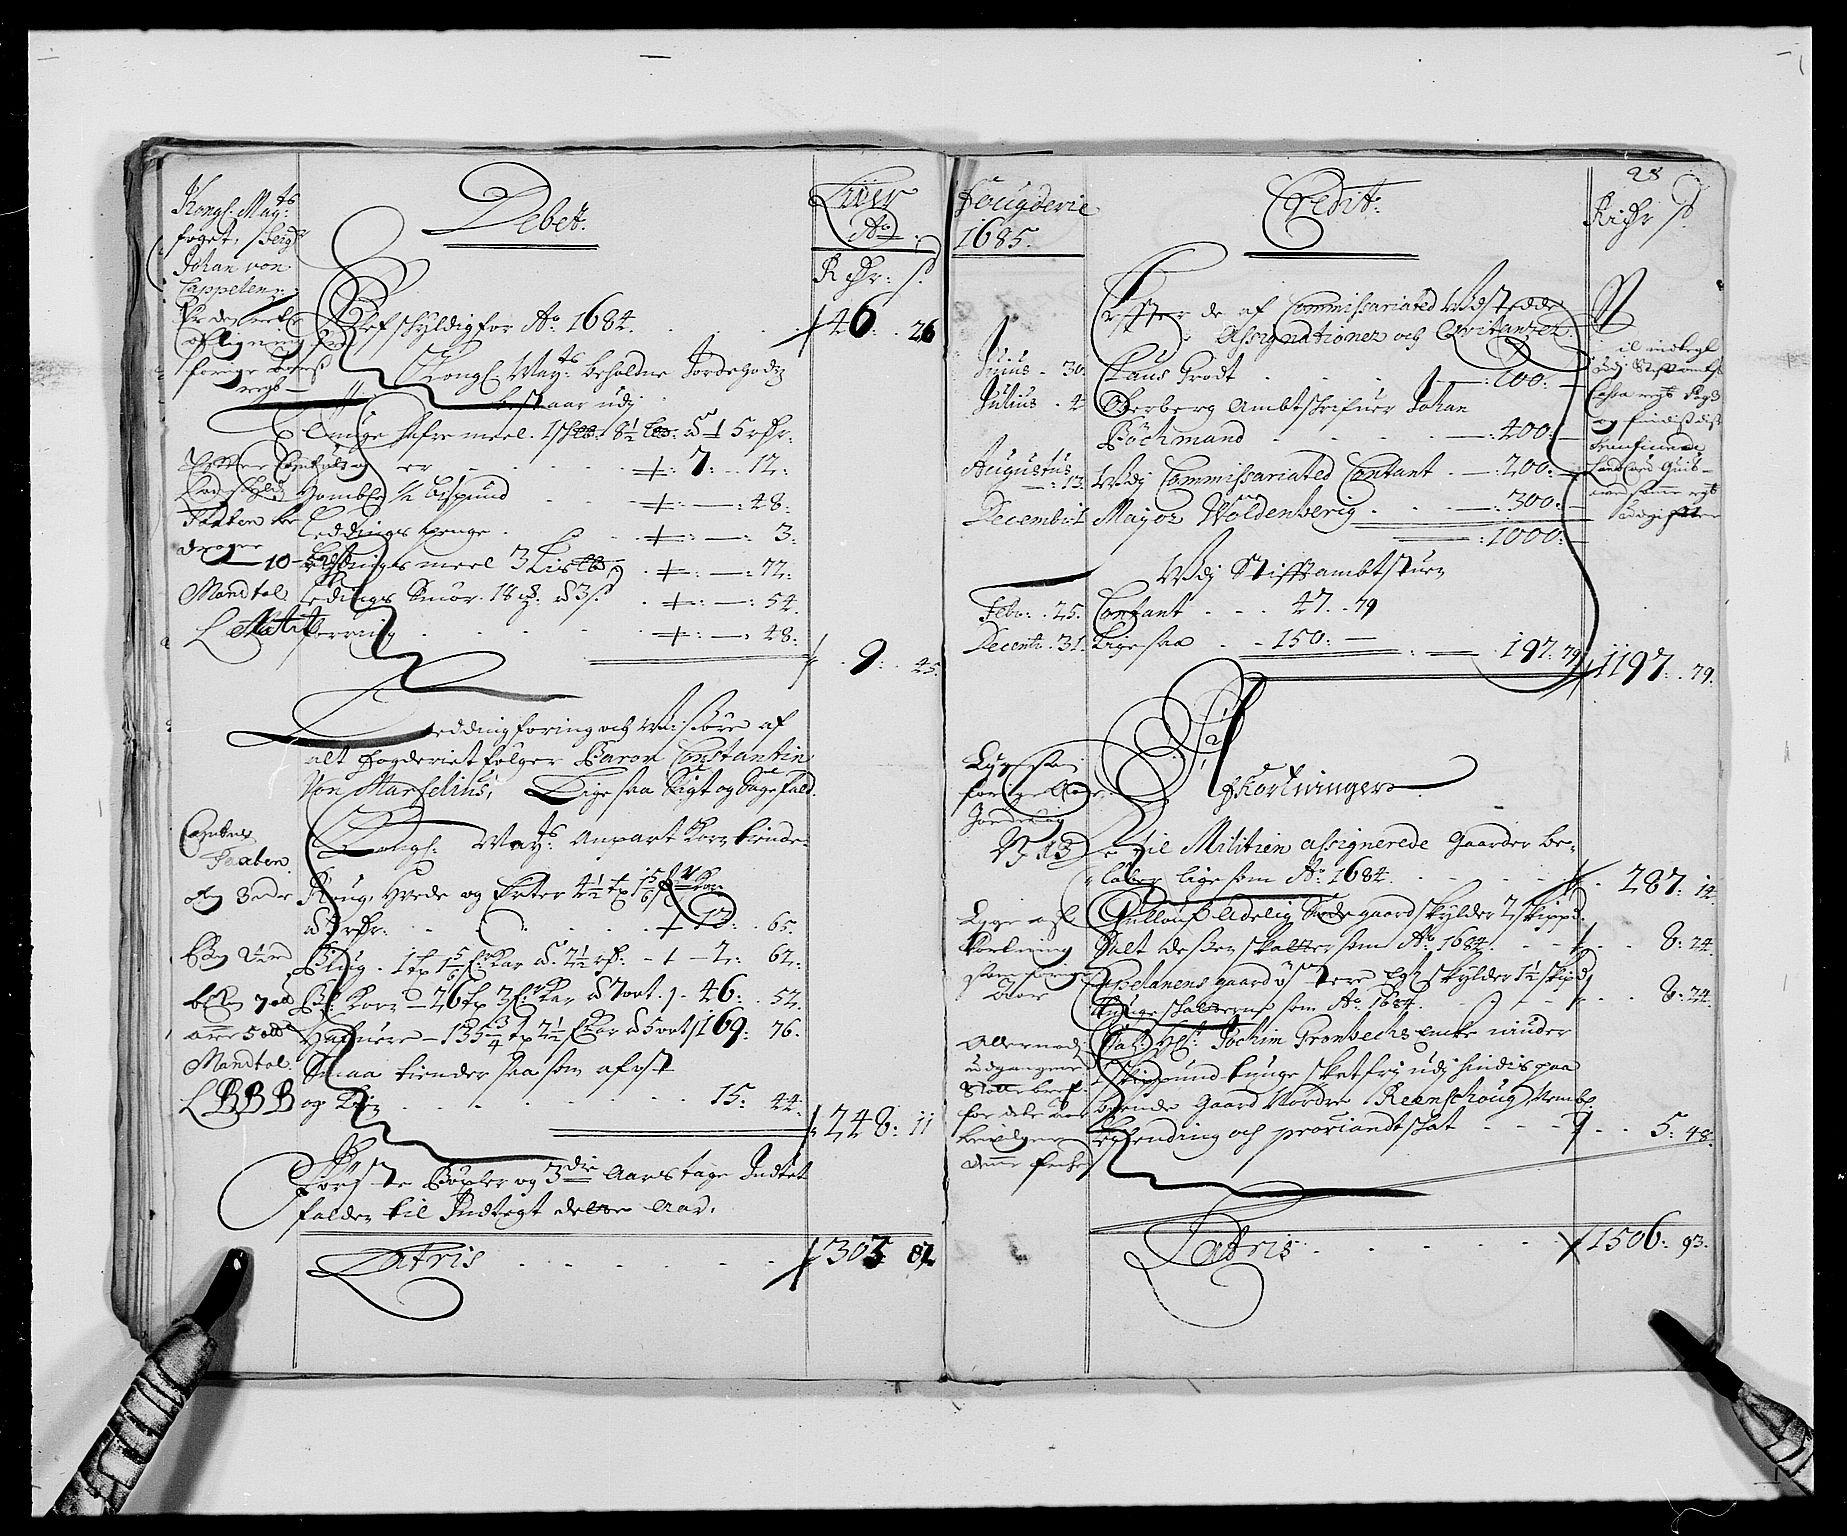 RA, Rentekammeret inntil 1814, Reviderte regnskaper, Fogderegnskap, R27/L1686: Fogderegnskap Lier, 1678-1686, s. 31